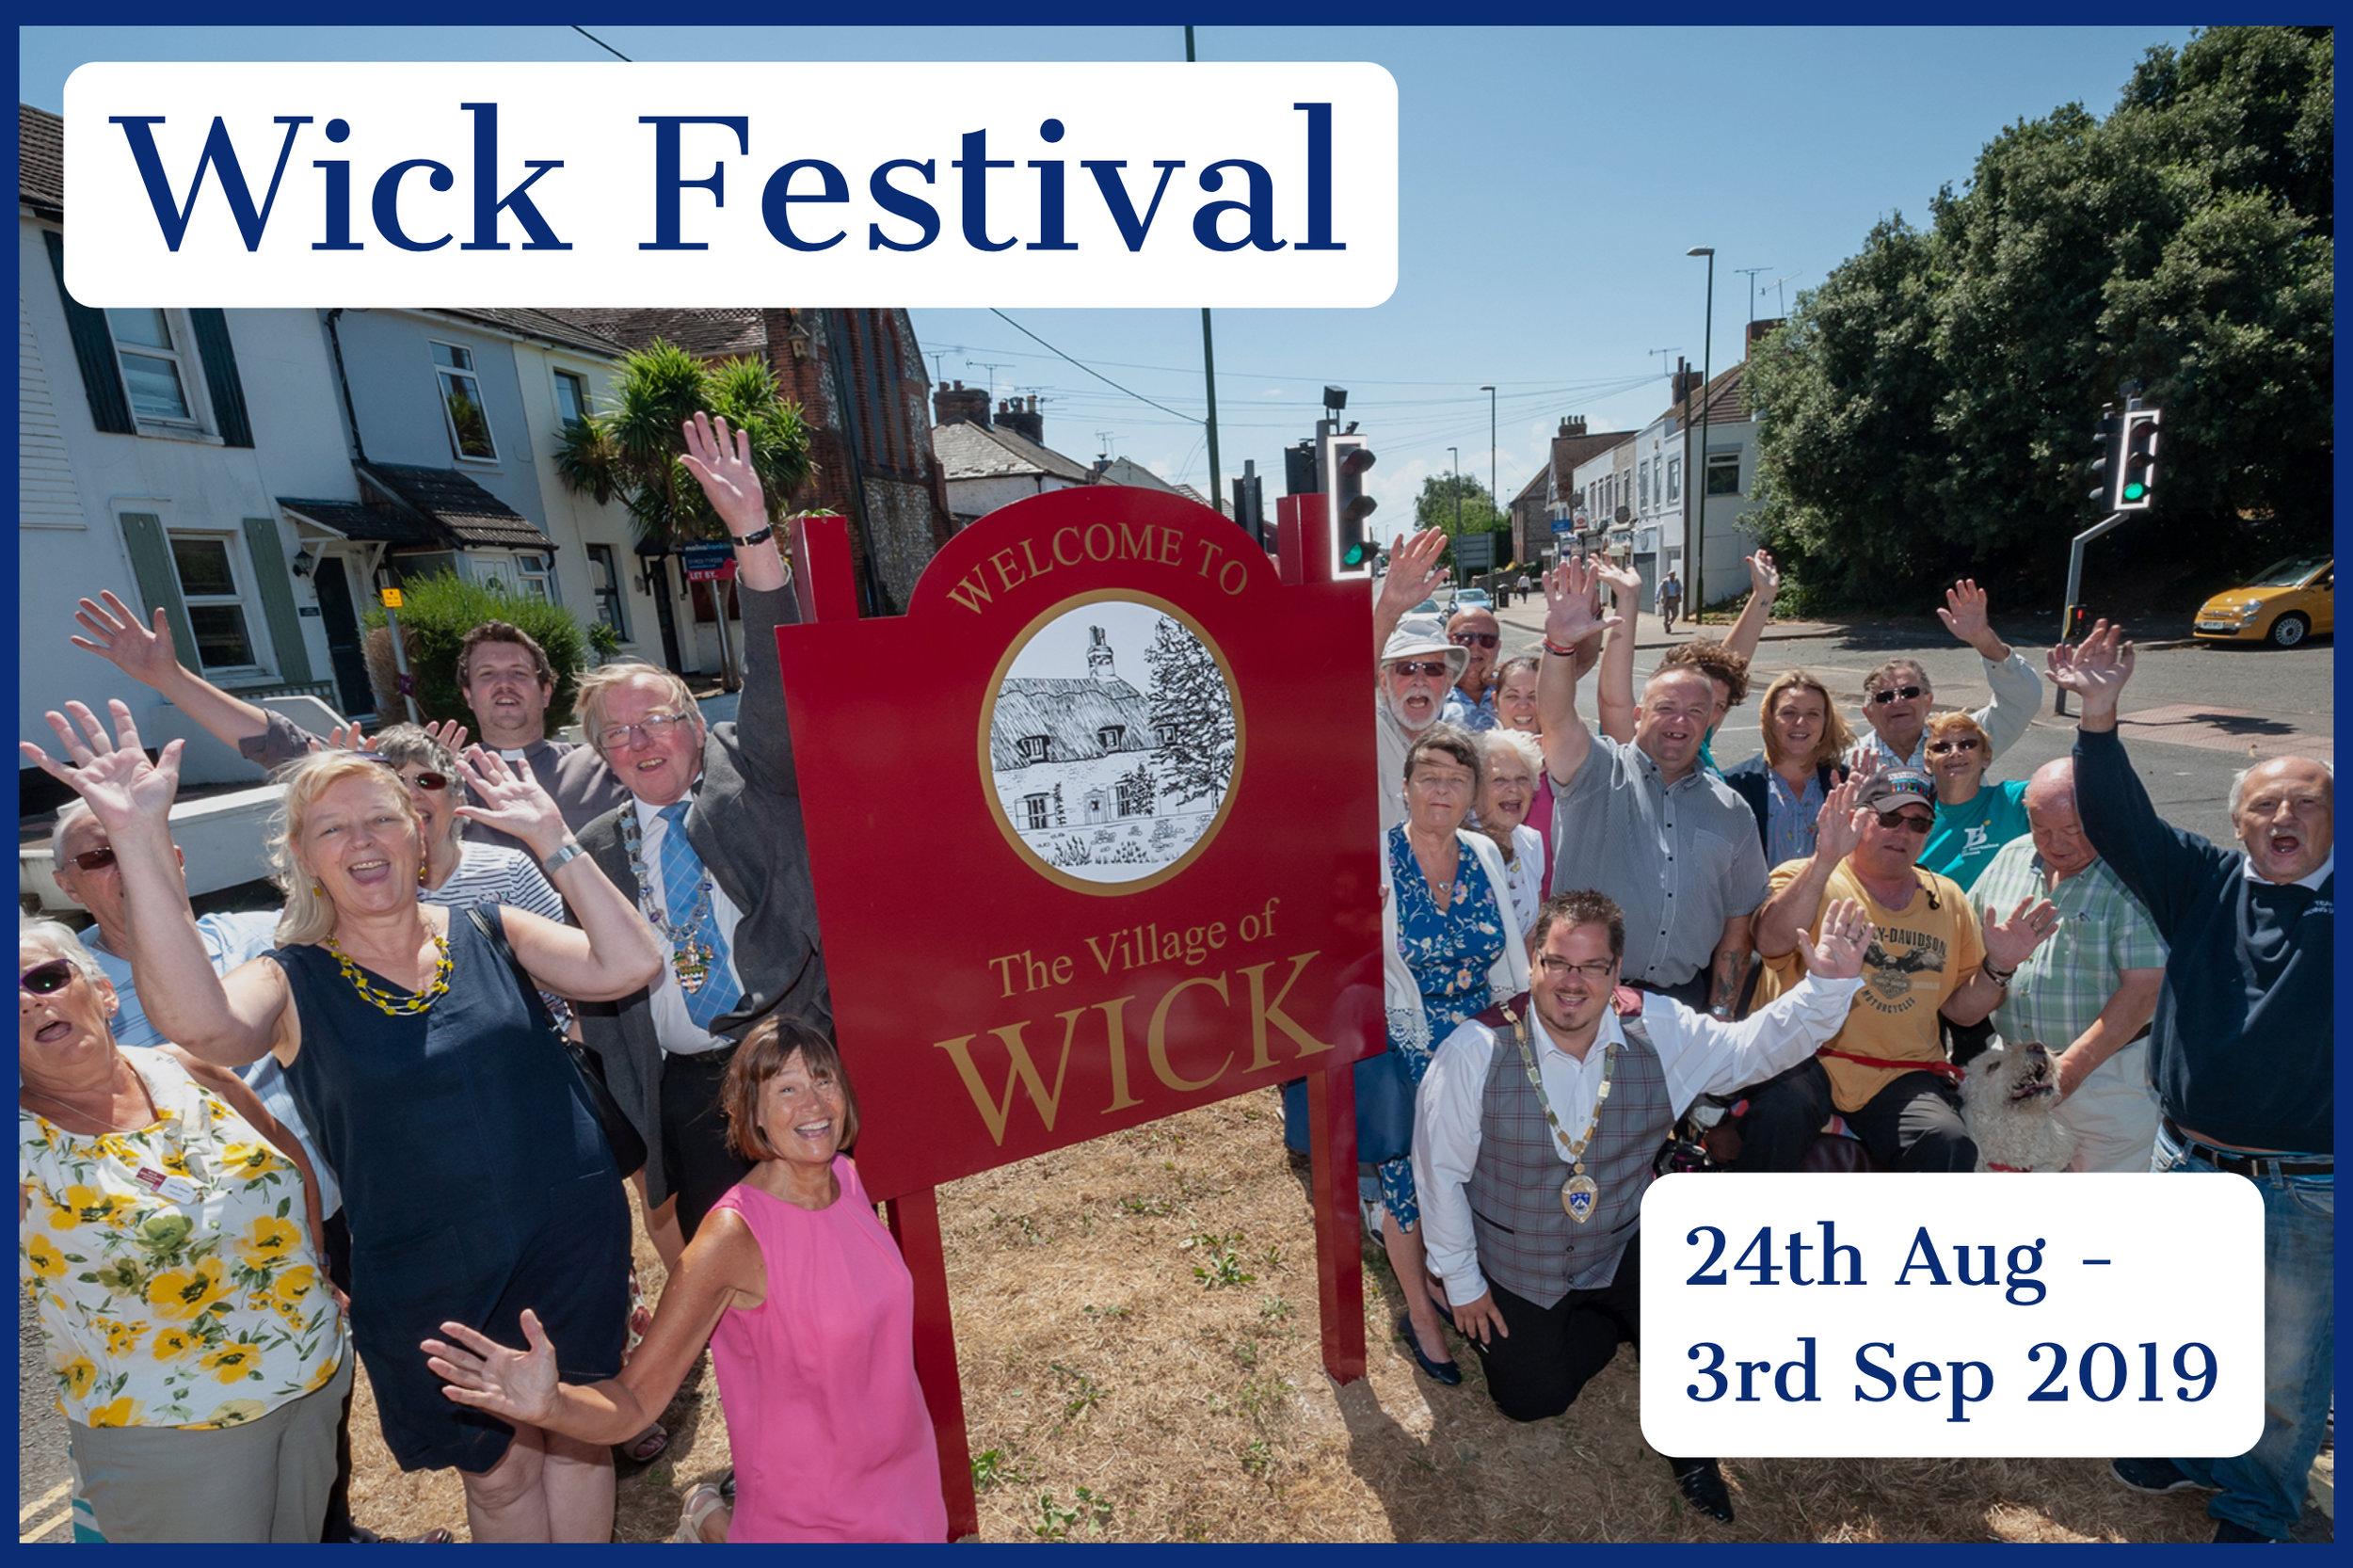 Wick Festival 2019.